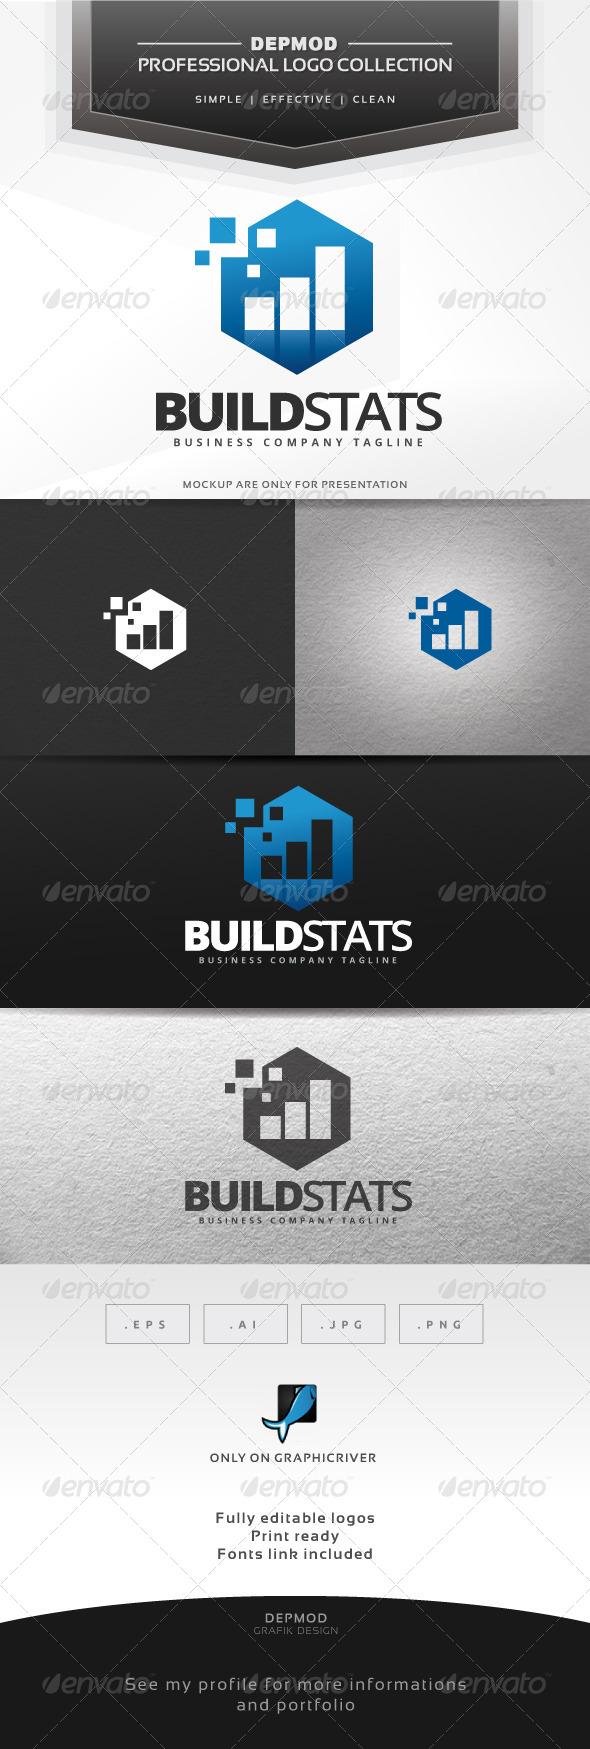 Build Stats Logo